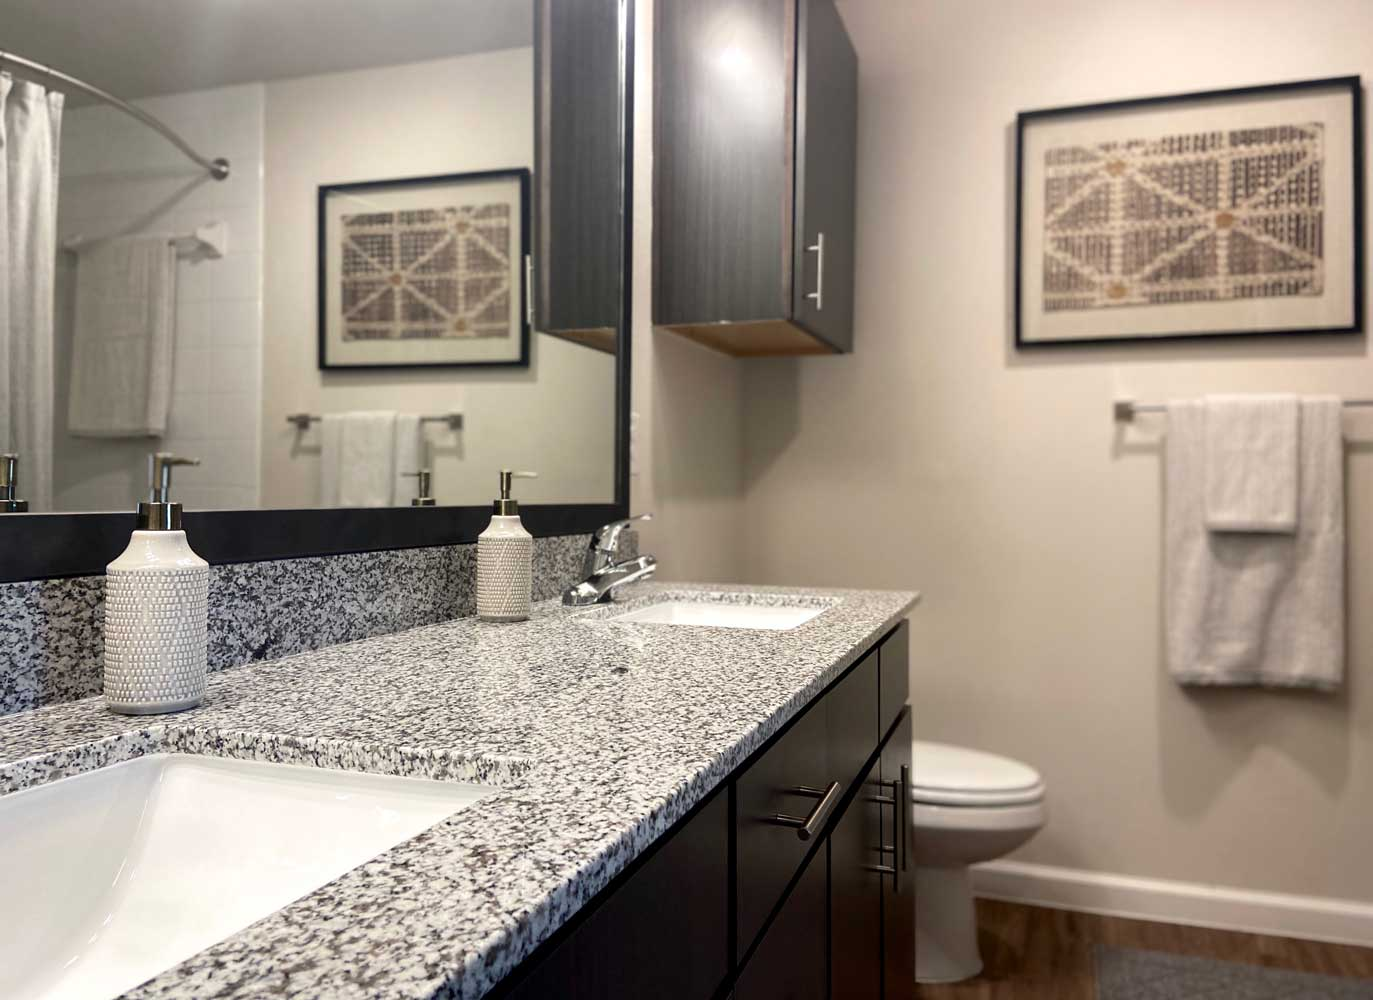 Bathroom at Oxford at Santa Clara Apartments in Pflugerville, Texas